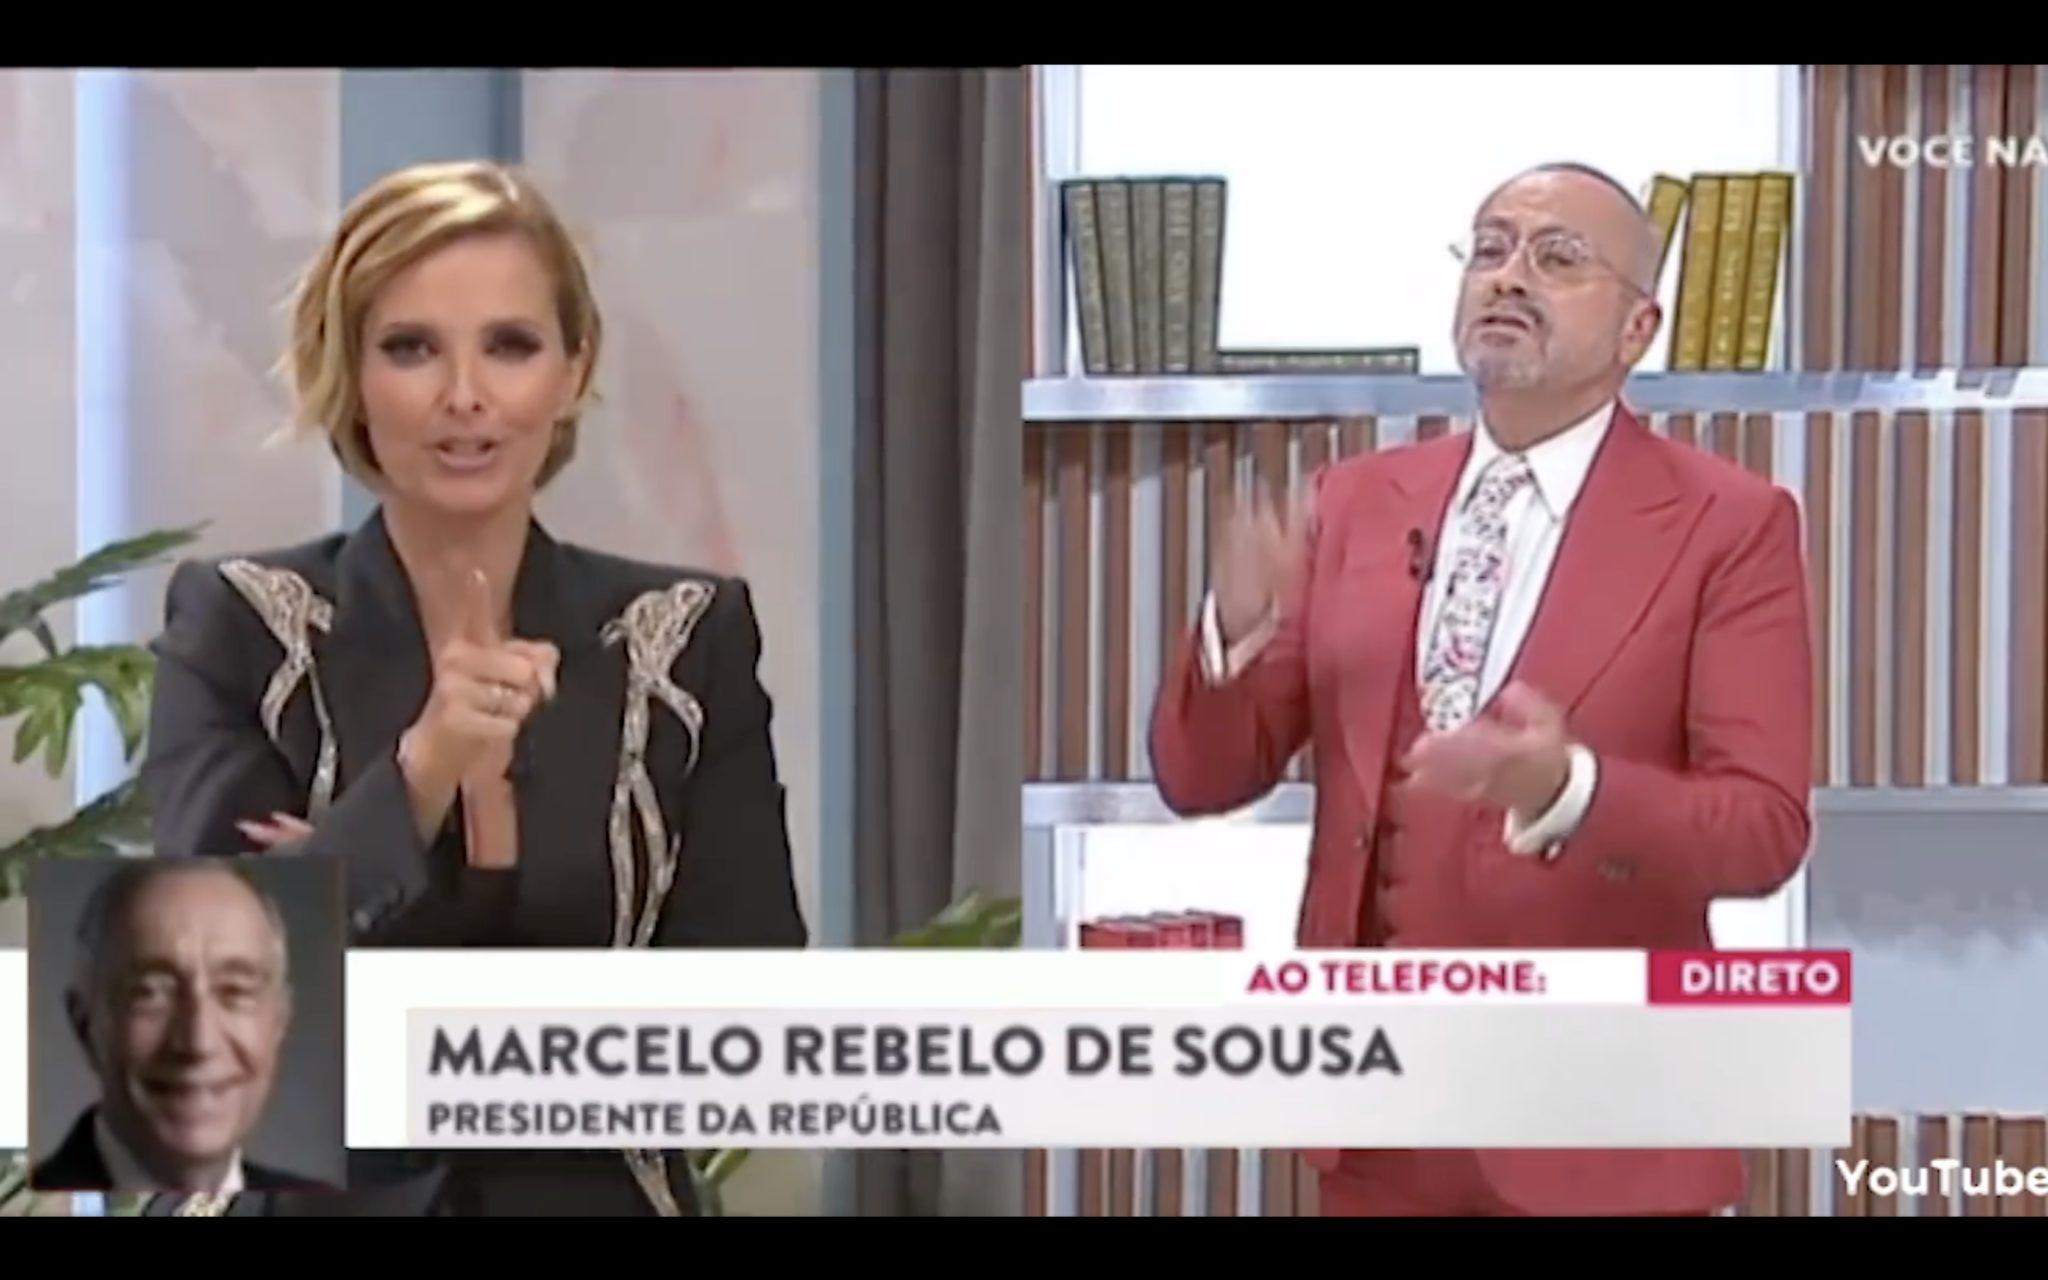 Cristina Ferreira Manuel Luis Goucha Paródia: Vídeo Brinca Com 'Guerra' Entre Cristina Ferreira E Manuel Luís Goucha